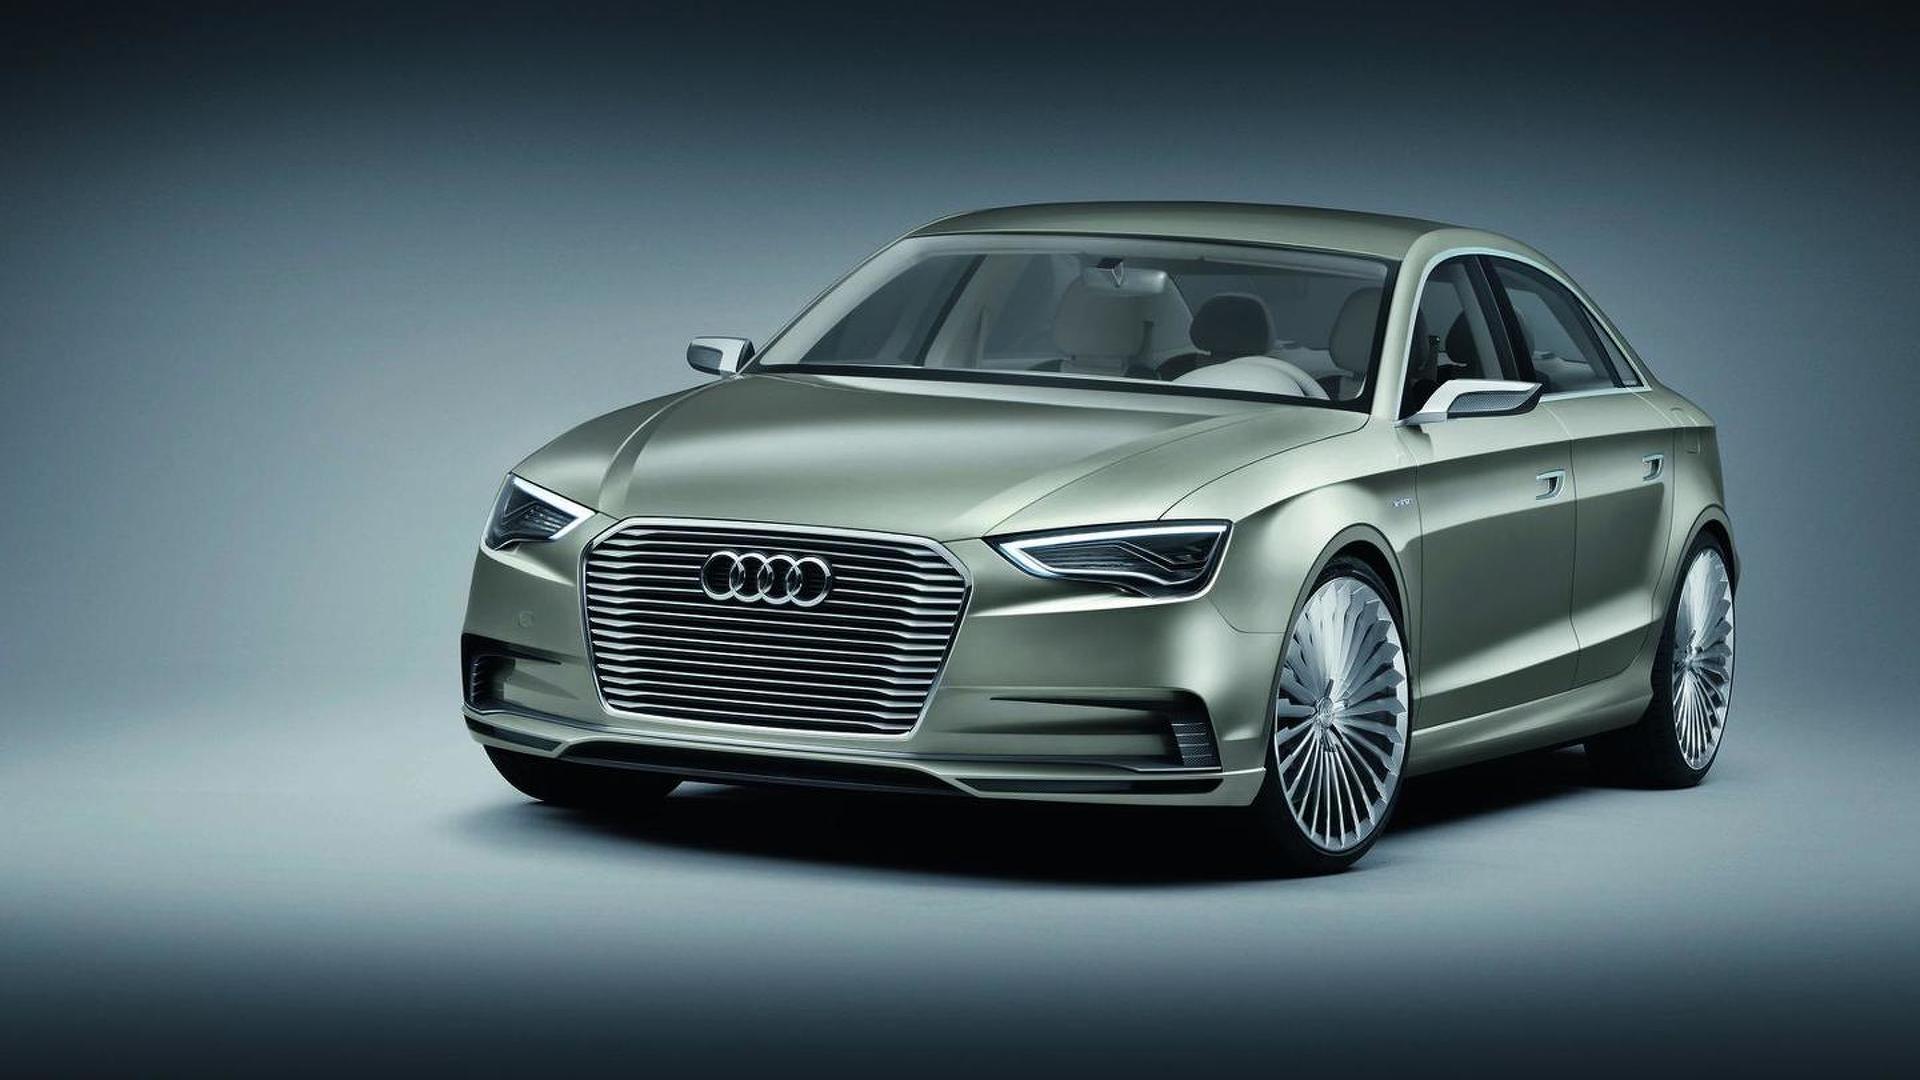 2012 next-generation Audi A3 details reported